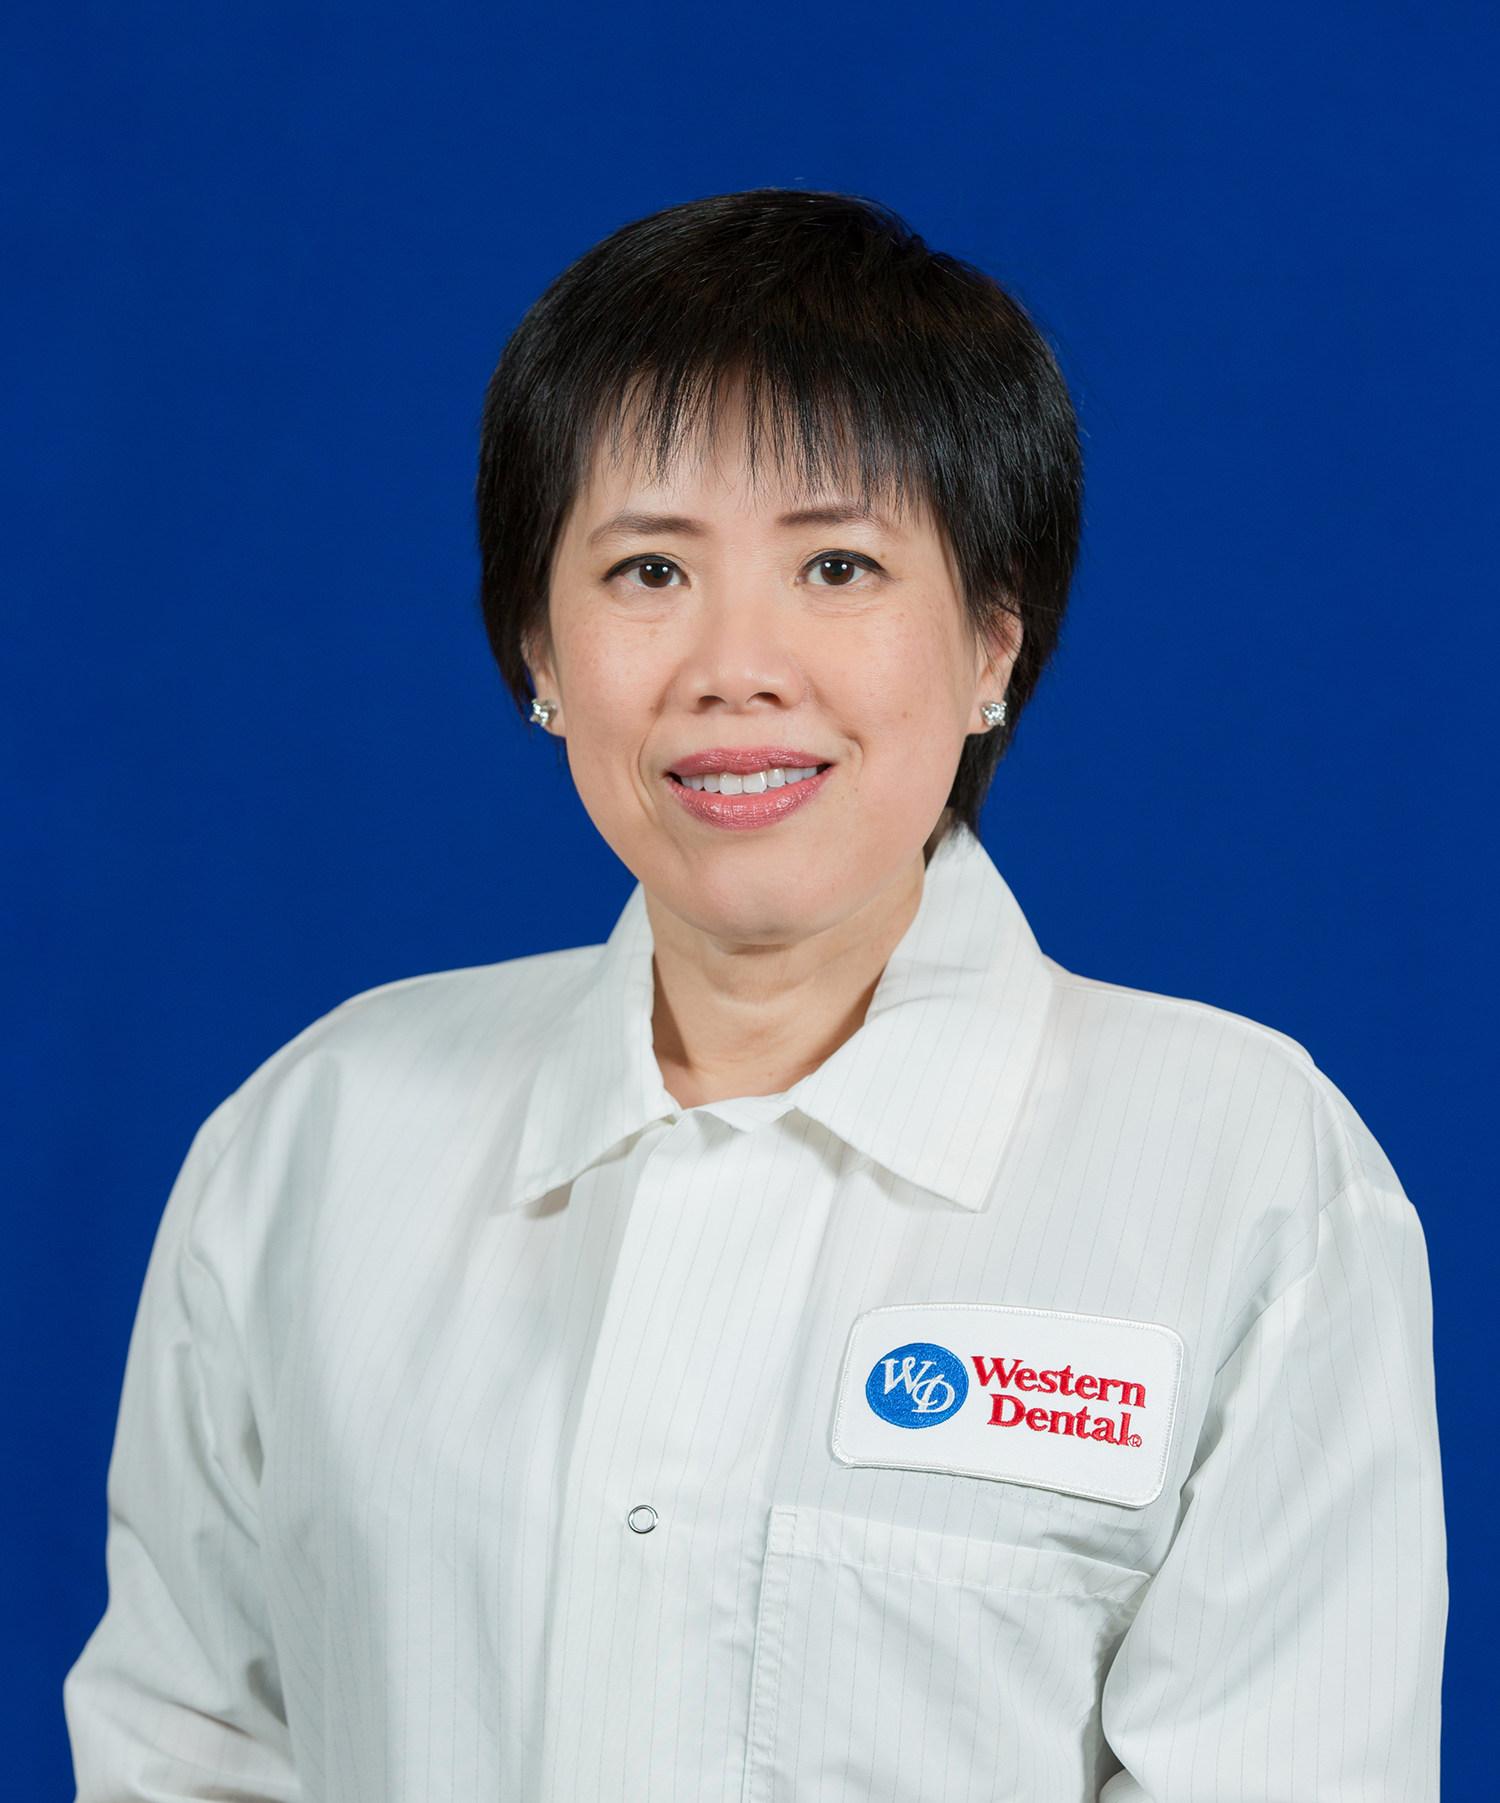 Dr. Vananh Ho, Managing Dentist at the San Jose location of Western Dental & Orthodontics on South King Road.